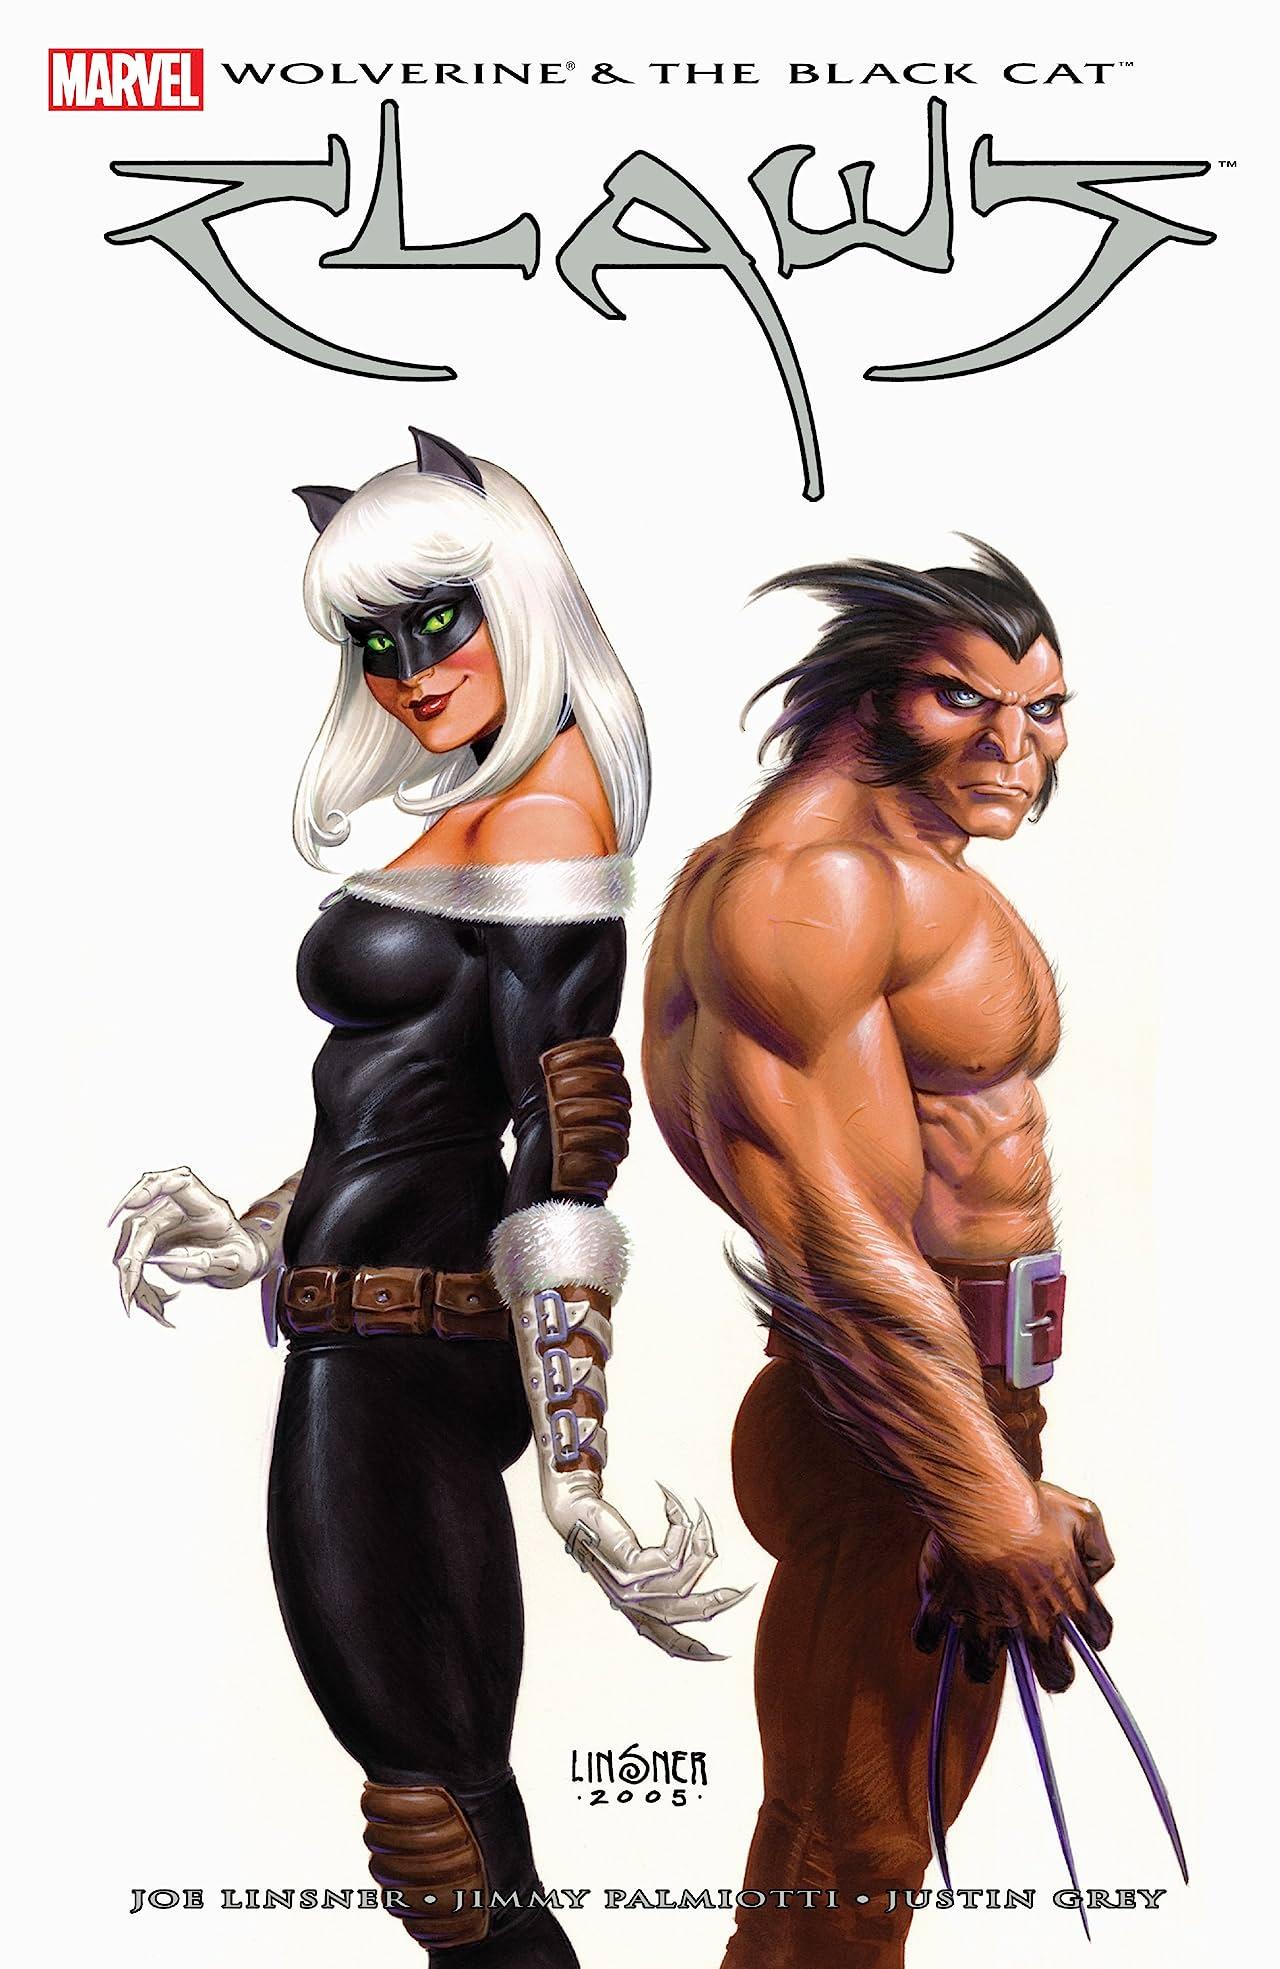 Wolverine & Black Cat: Claws